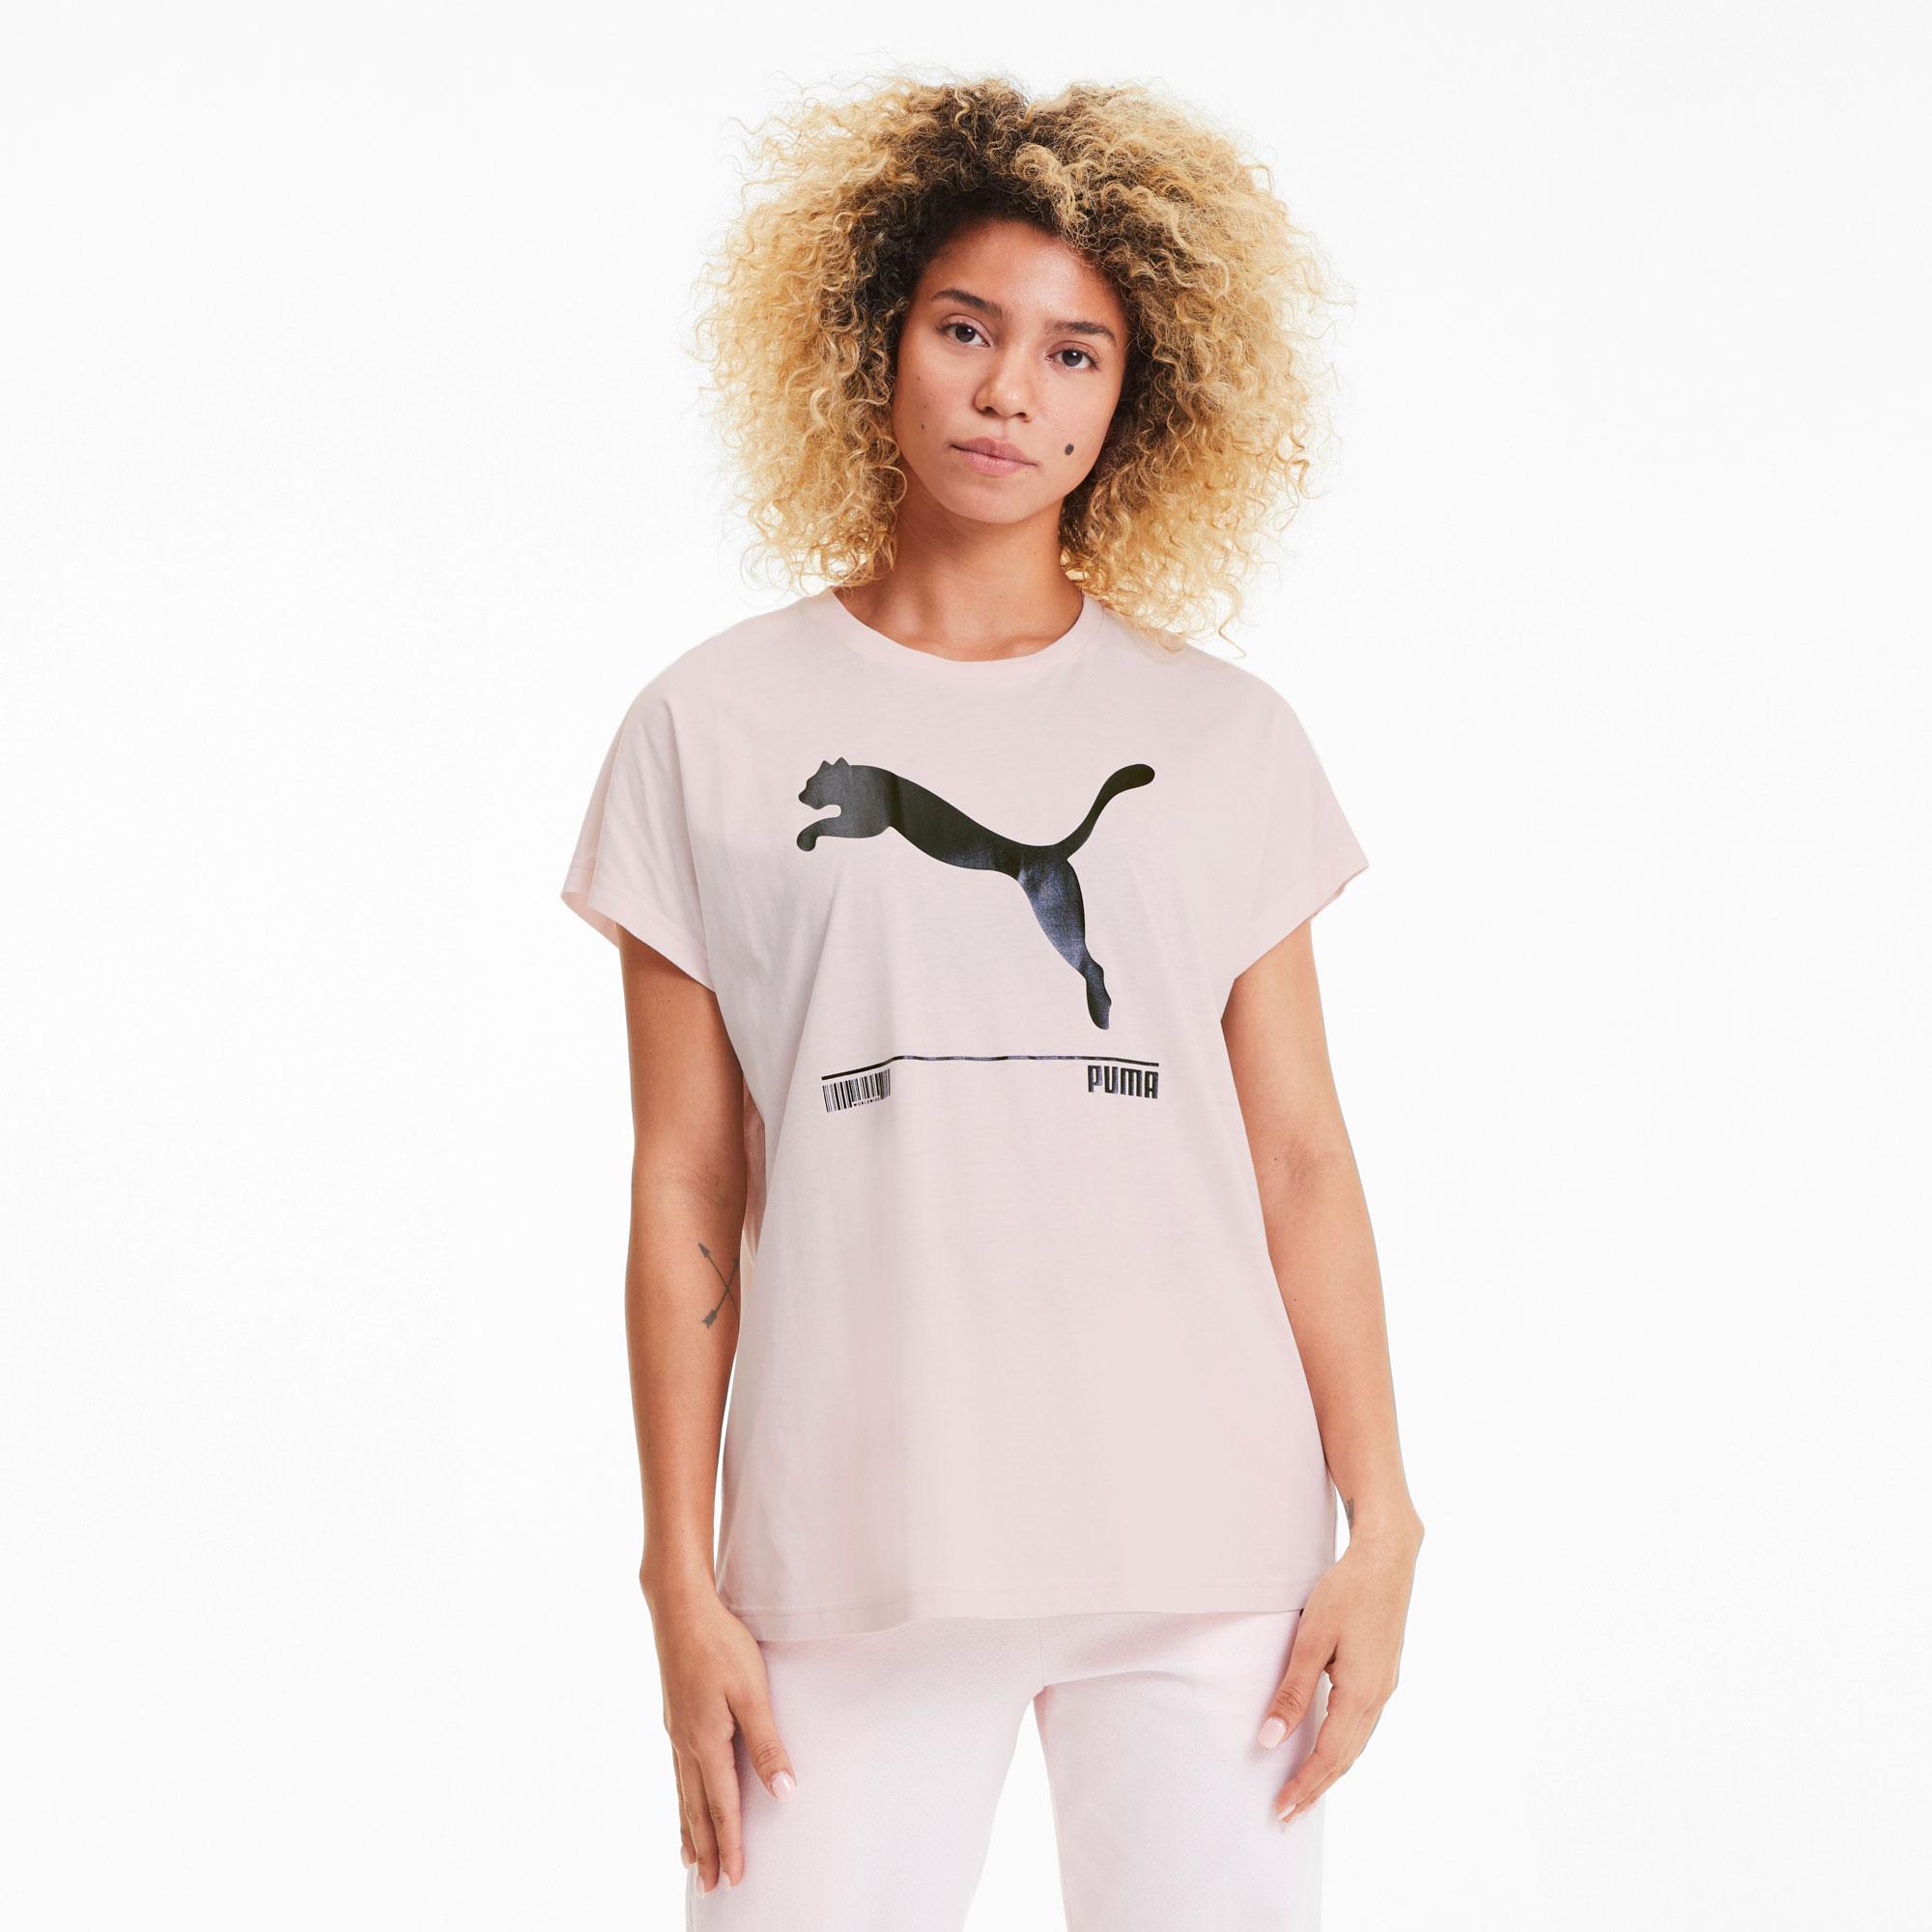 Puma Women's Nu-tility Tee 581371-17